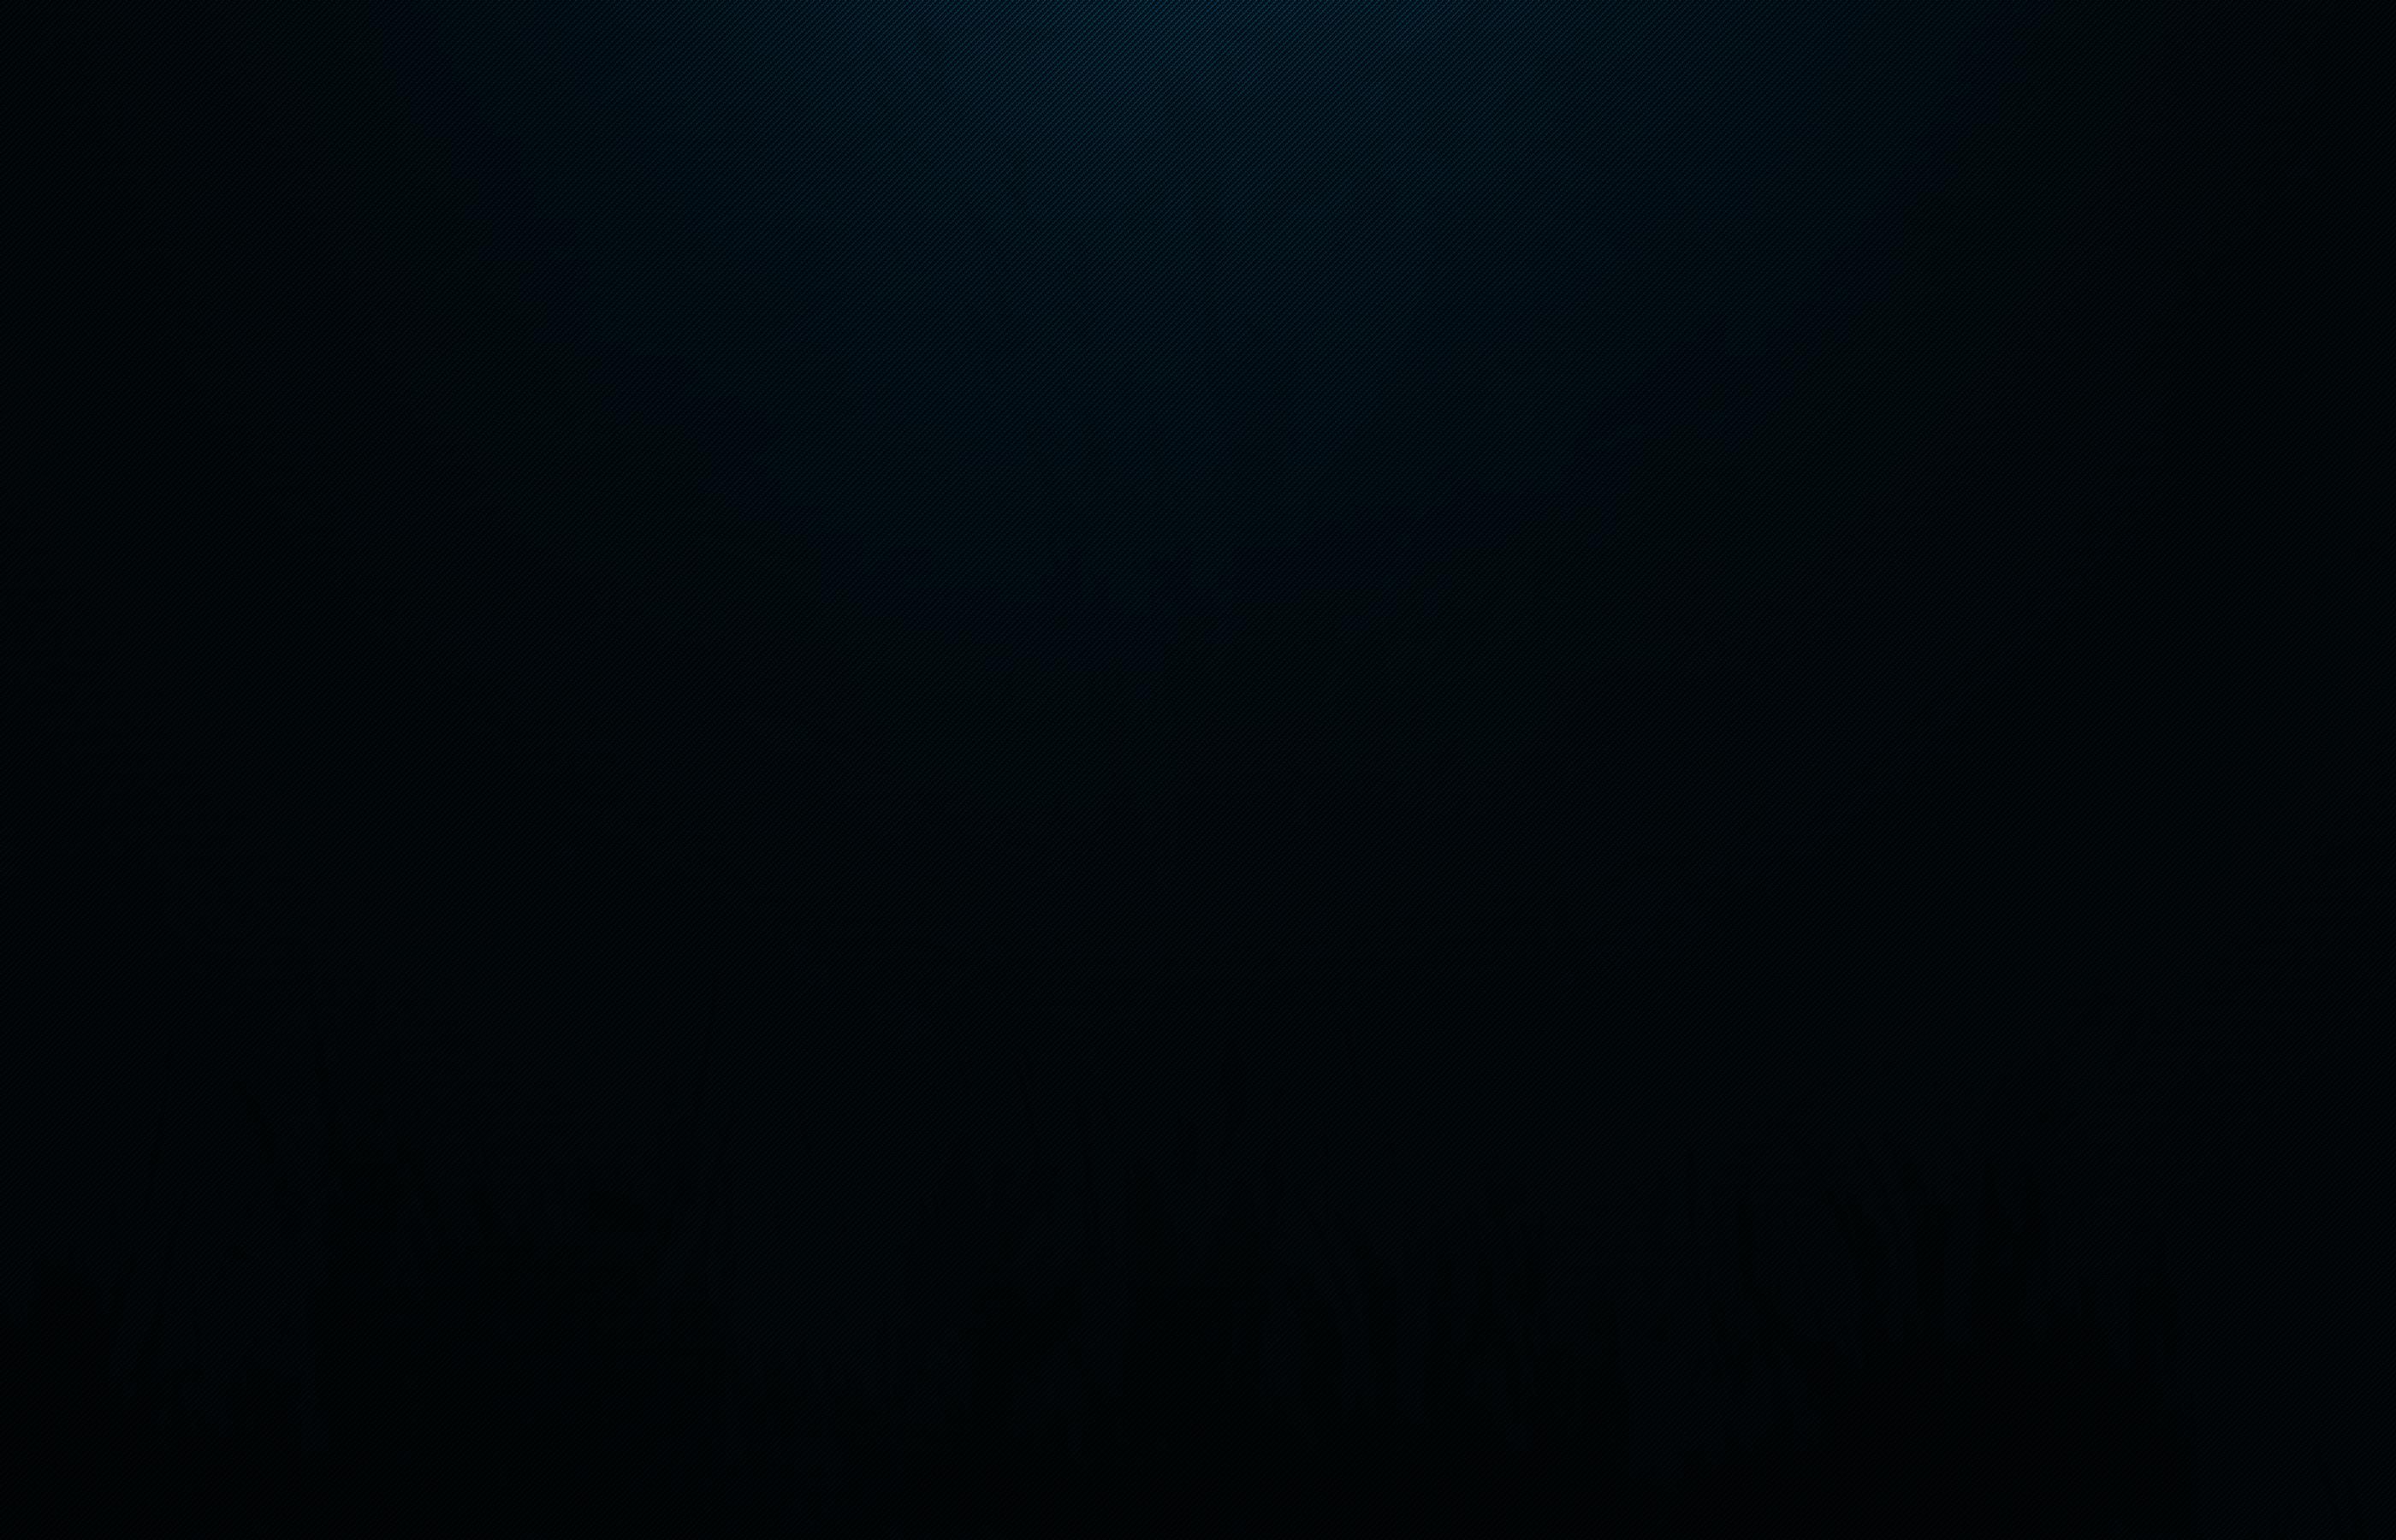 Dark Blue Background Wallpaper - WallpaperSafari